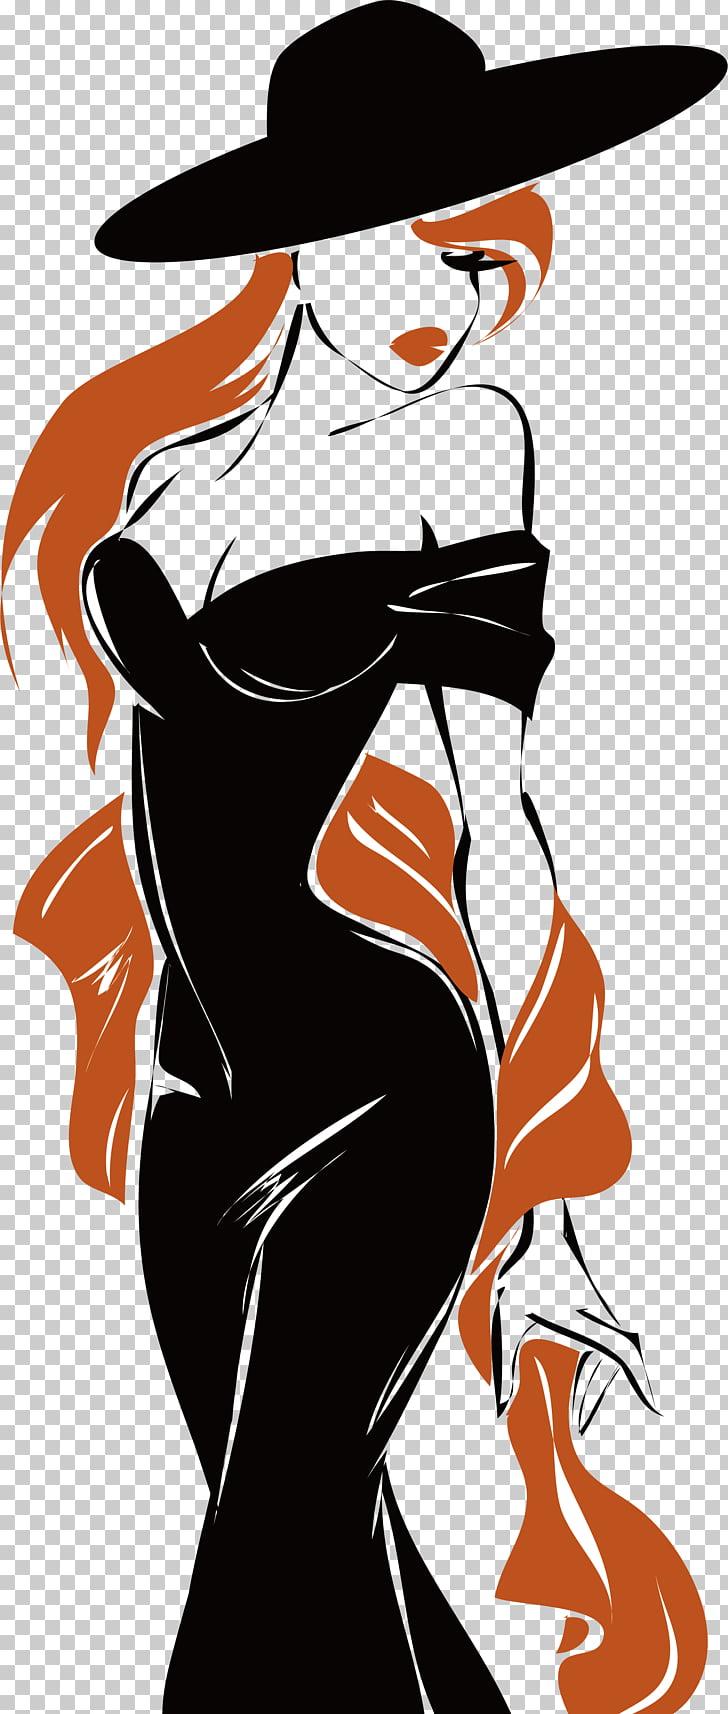 Fashion Model Logo, Cartoon model design, woman with wearing.